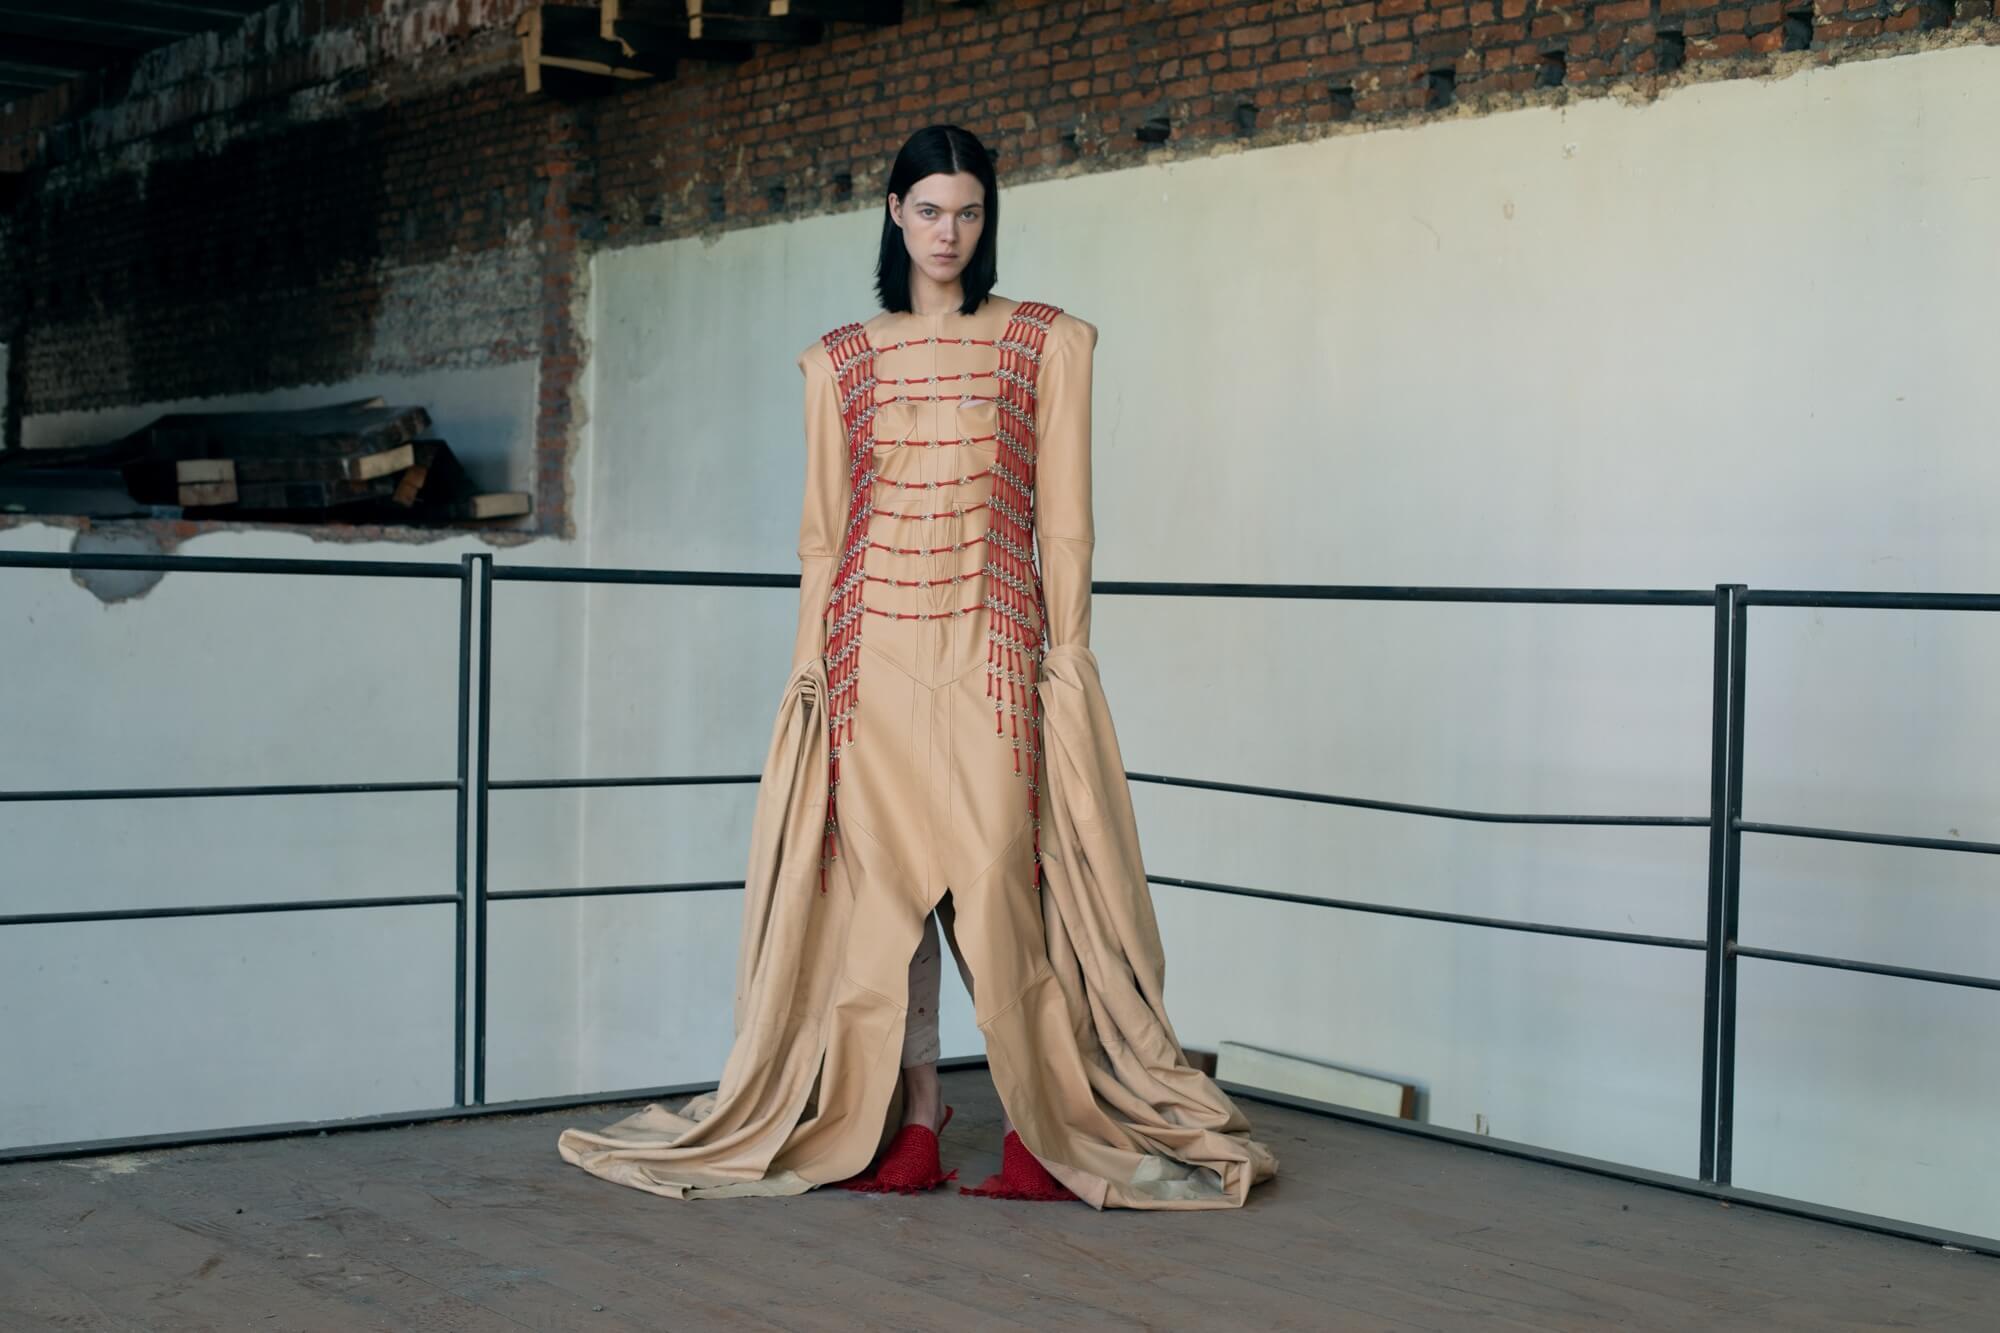 Modell im Kleid